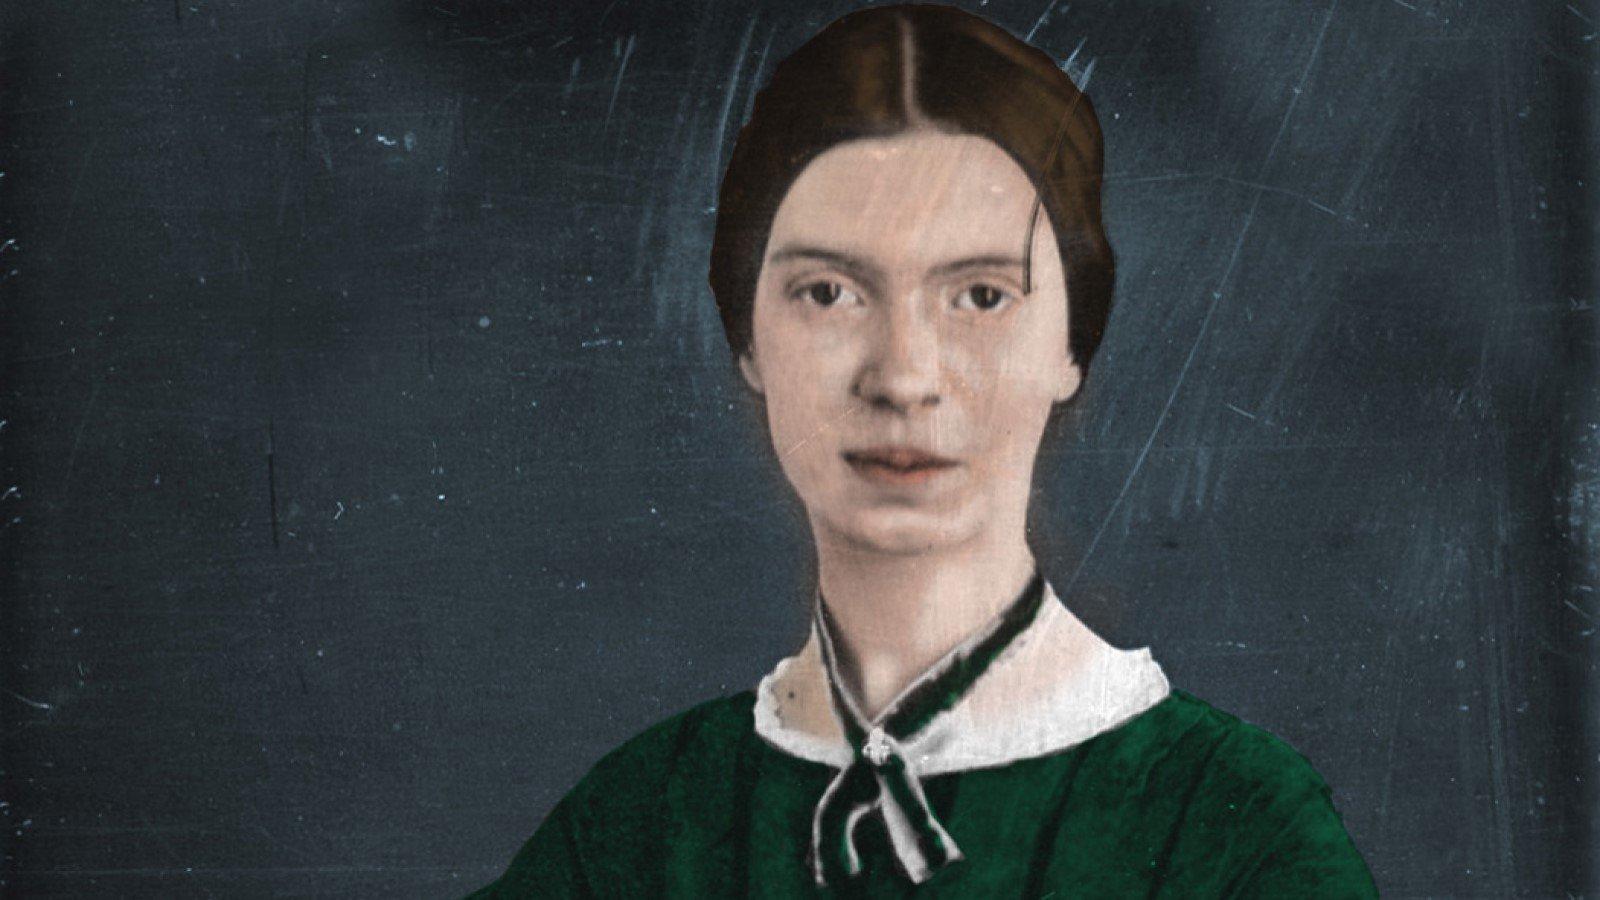 'Daily Revelations': Emily Dickinson's Everyday Transcendence